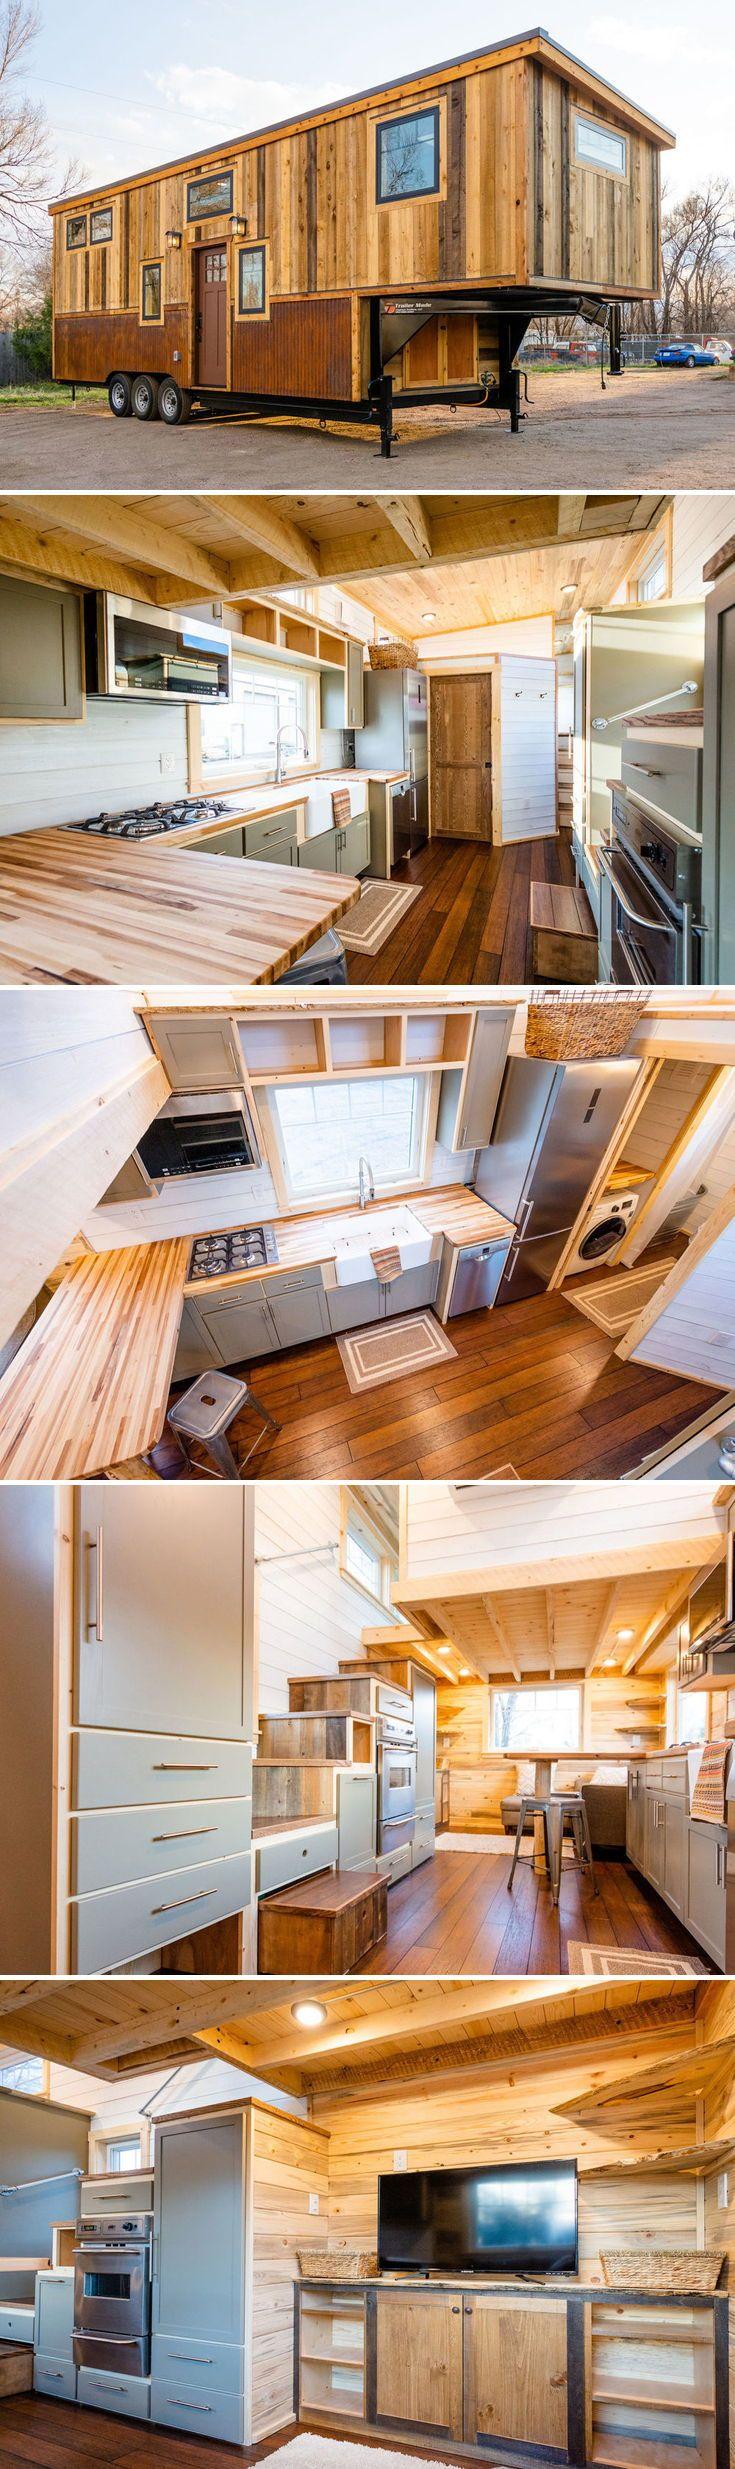 Ross' 35' Gooseneck Tiny House by Mitchcraft Tiny Homes #tinyhome